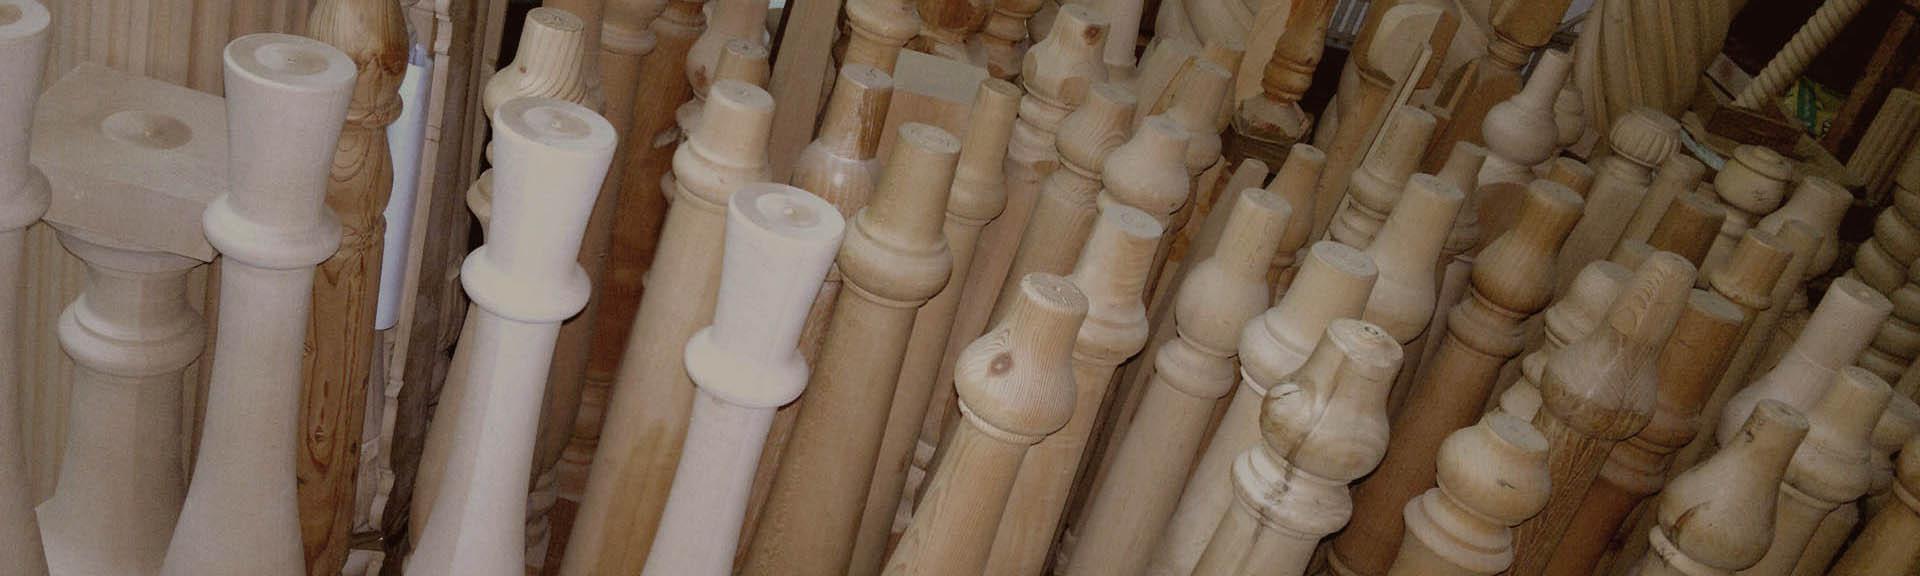 Tornitura Effepi, Fresatura Elicoidale, Gambe tavolo, Scala in legno ...